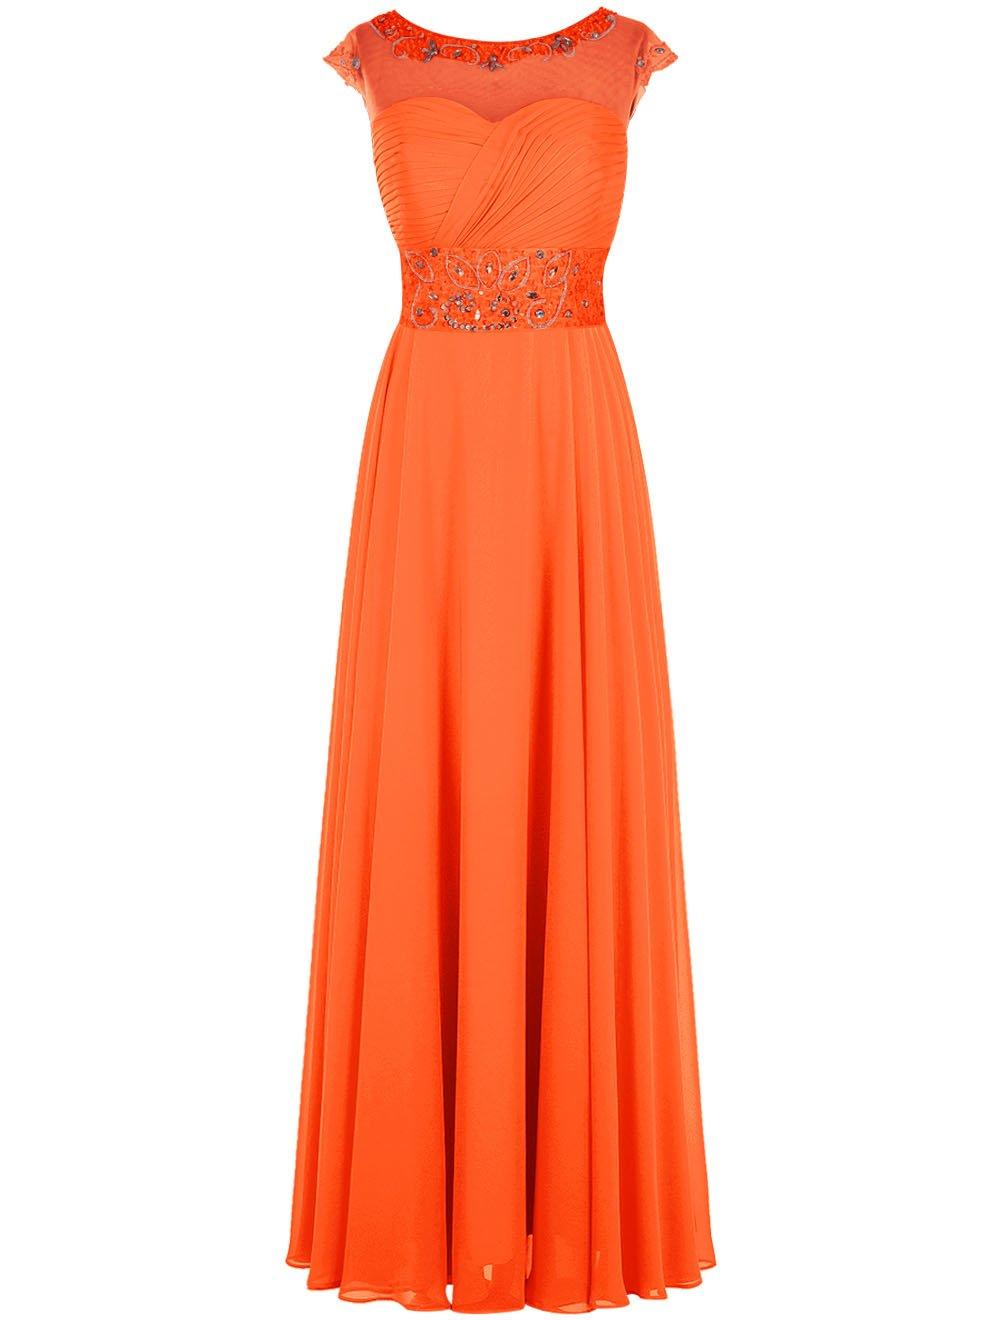 Dresstell(ドレステル) 結婚式 フォーマルドレス ビジュー付き キャップ袖 ロング丈 レディース B019MSSTXK JP13|オレンジ オレンジ JP13